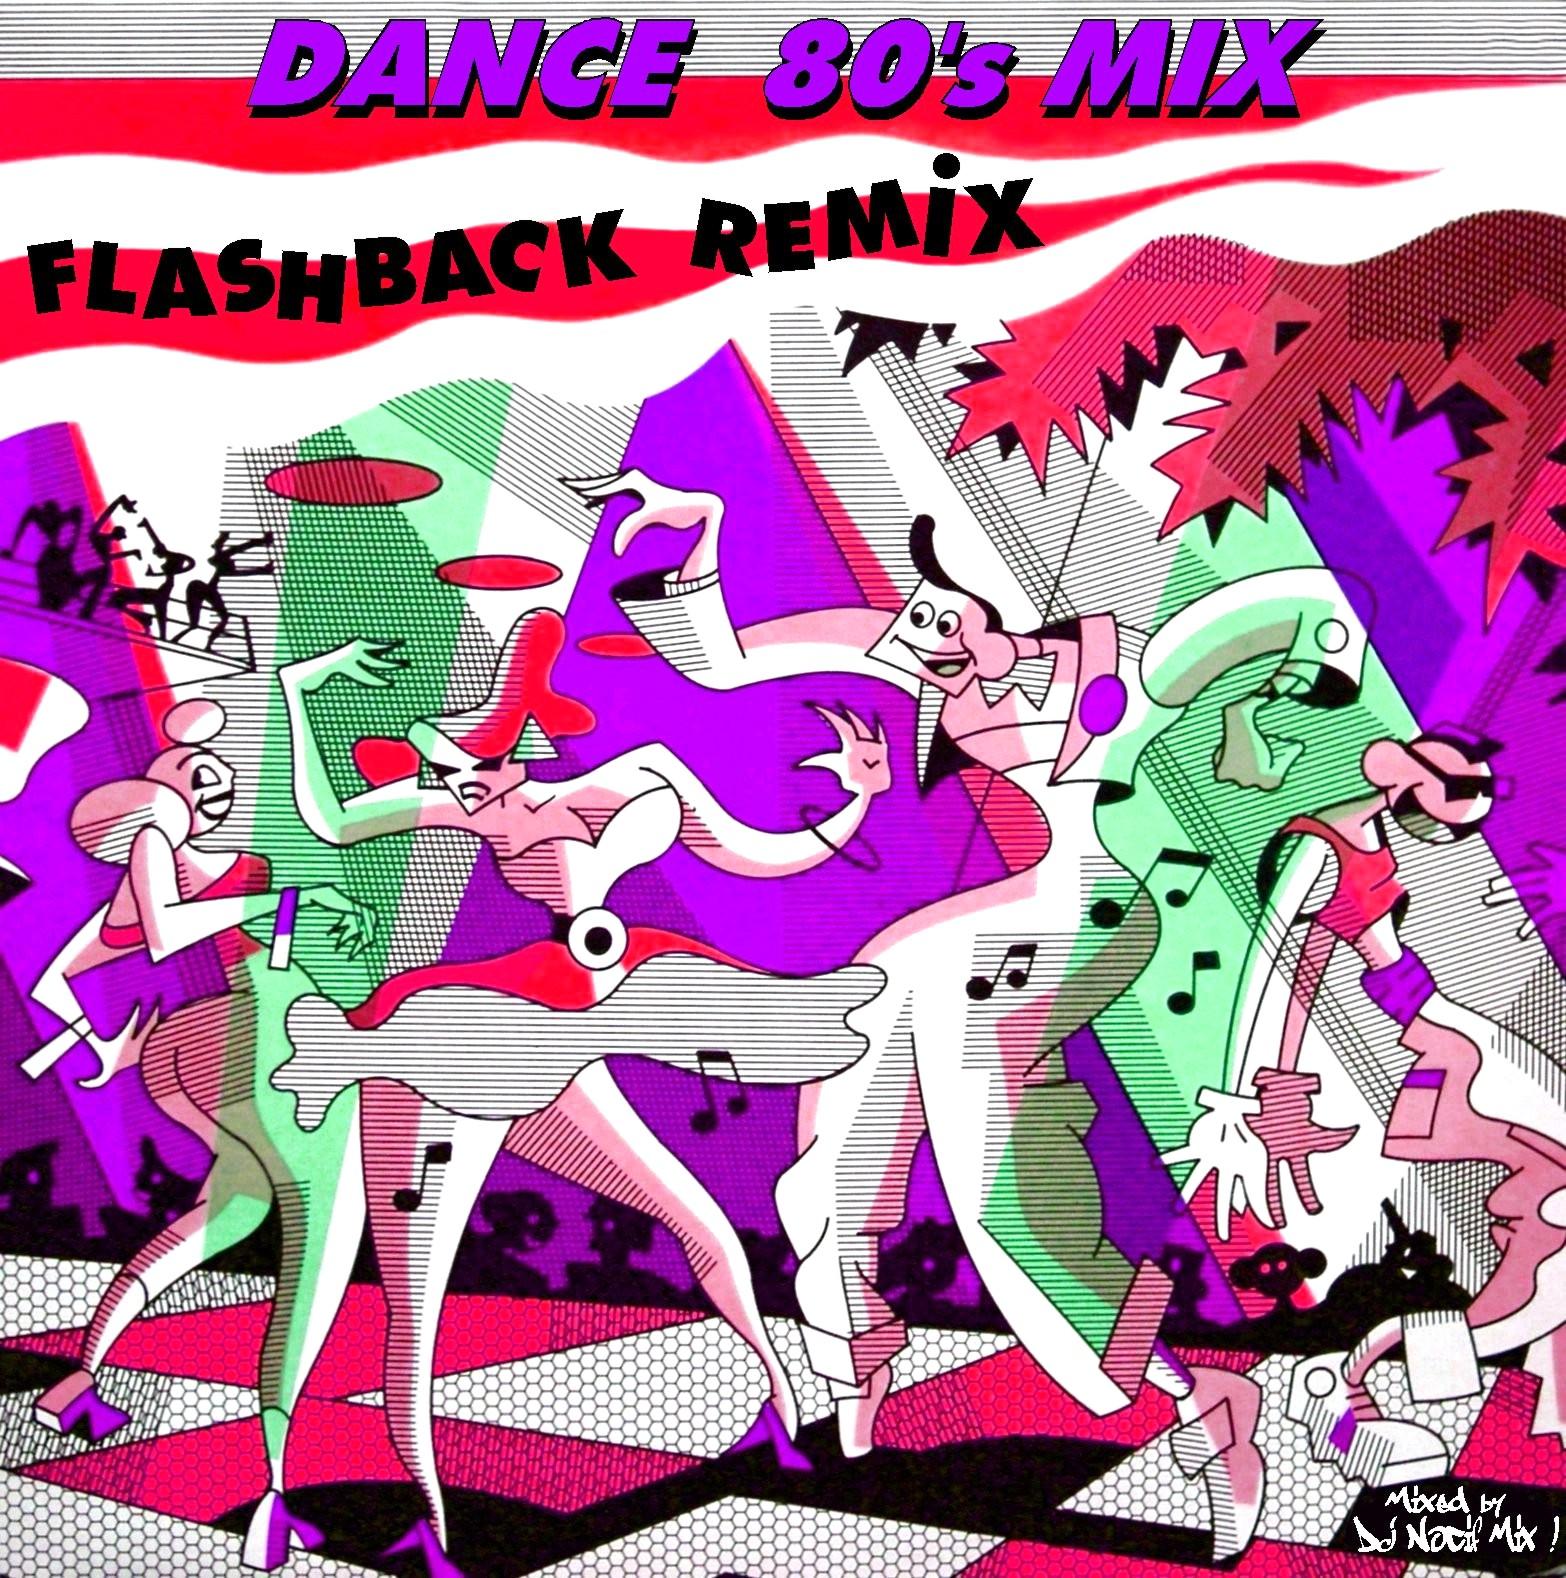 http://2.bp.blogspot.com/-5OVWZdqvxQc/UUGm8Hi7RbI/AAAAAAAAG8o/CzH87997-20/s1600/Dance+80%27s+Mix+%27%27Flashback+Remix%27%27+(by+DJ+Nocif+Mix+!).jpg